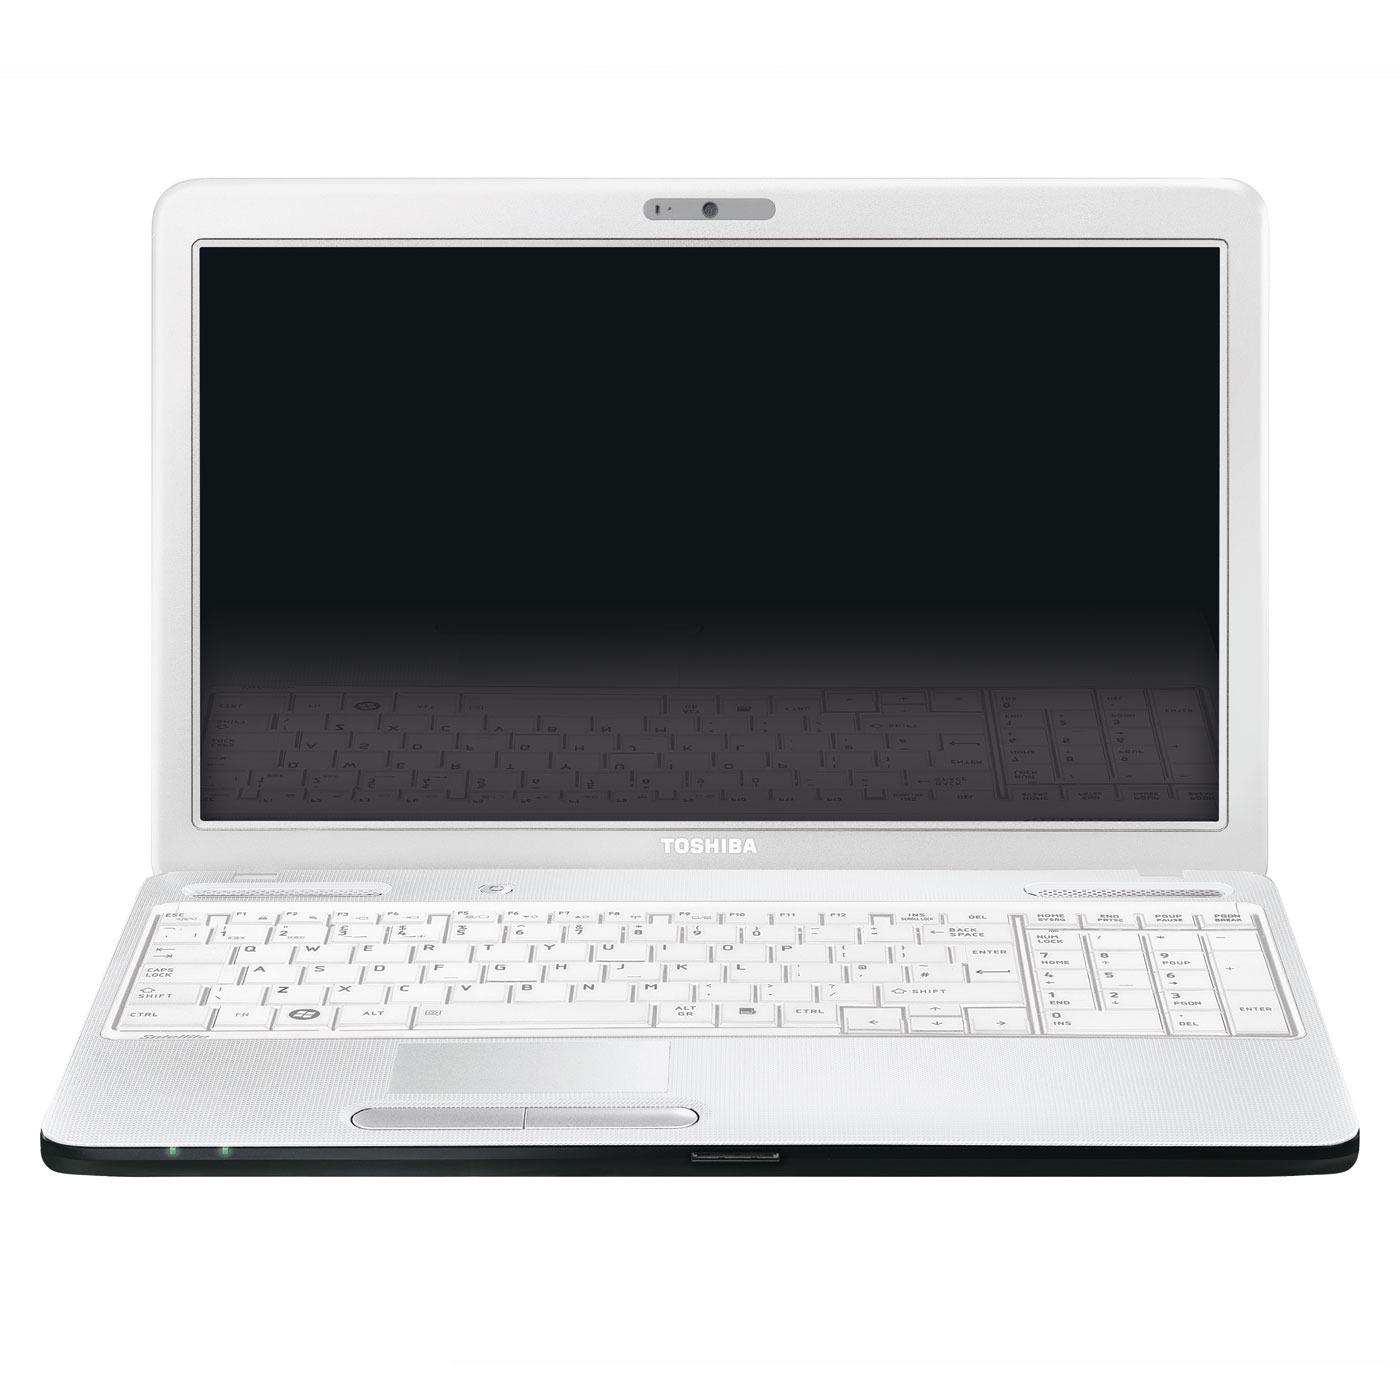 Toshiba Satellite C660 246 Blanc